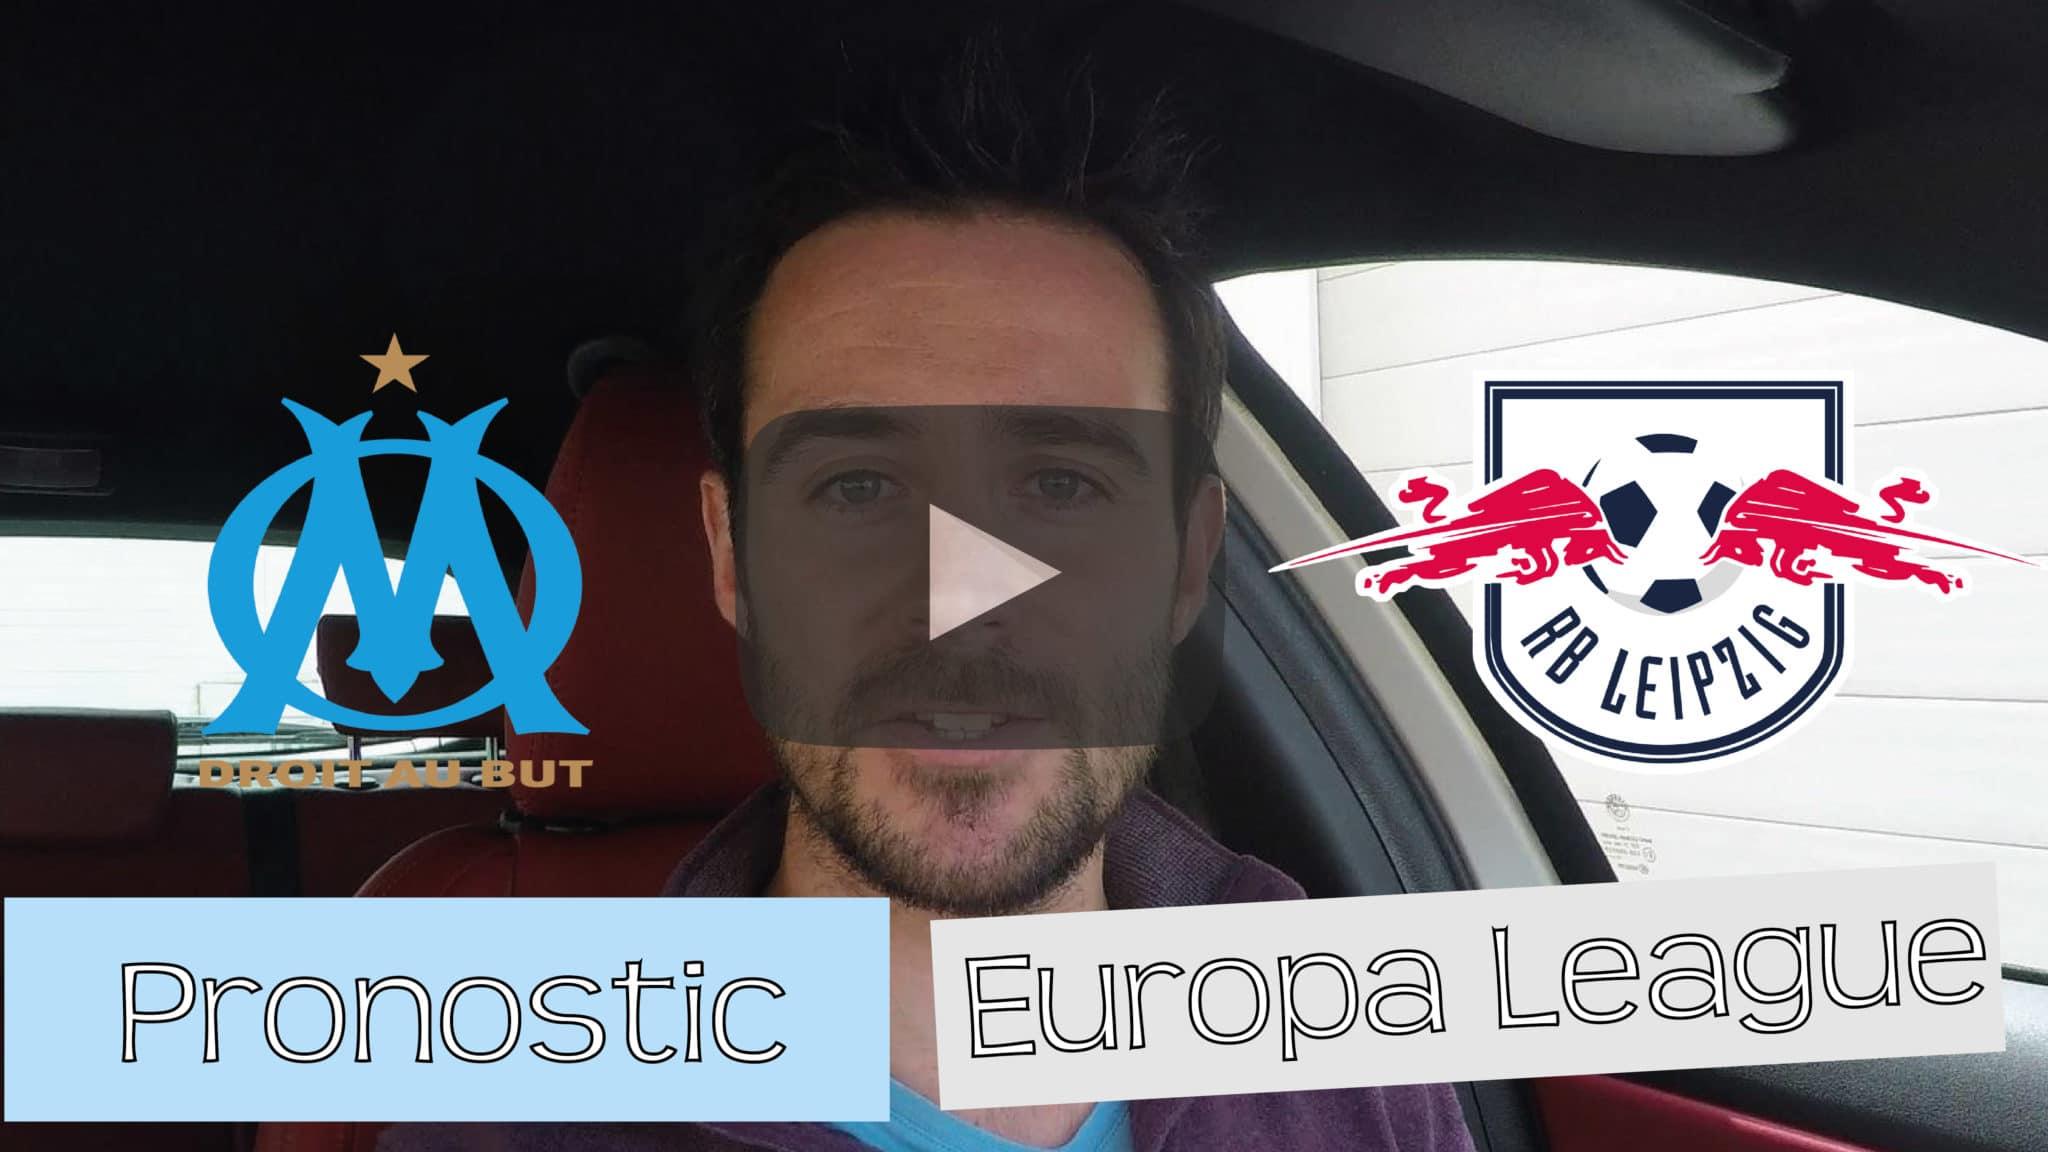 [Public] Pronostic 10 – Marseille / RB Leipzig – Ligue Europa